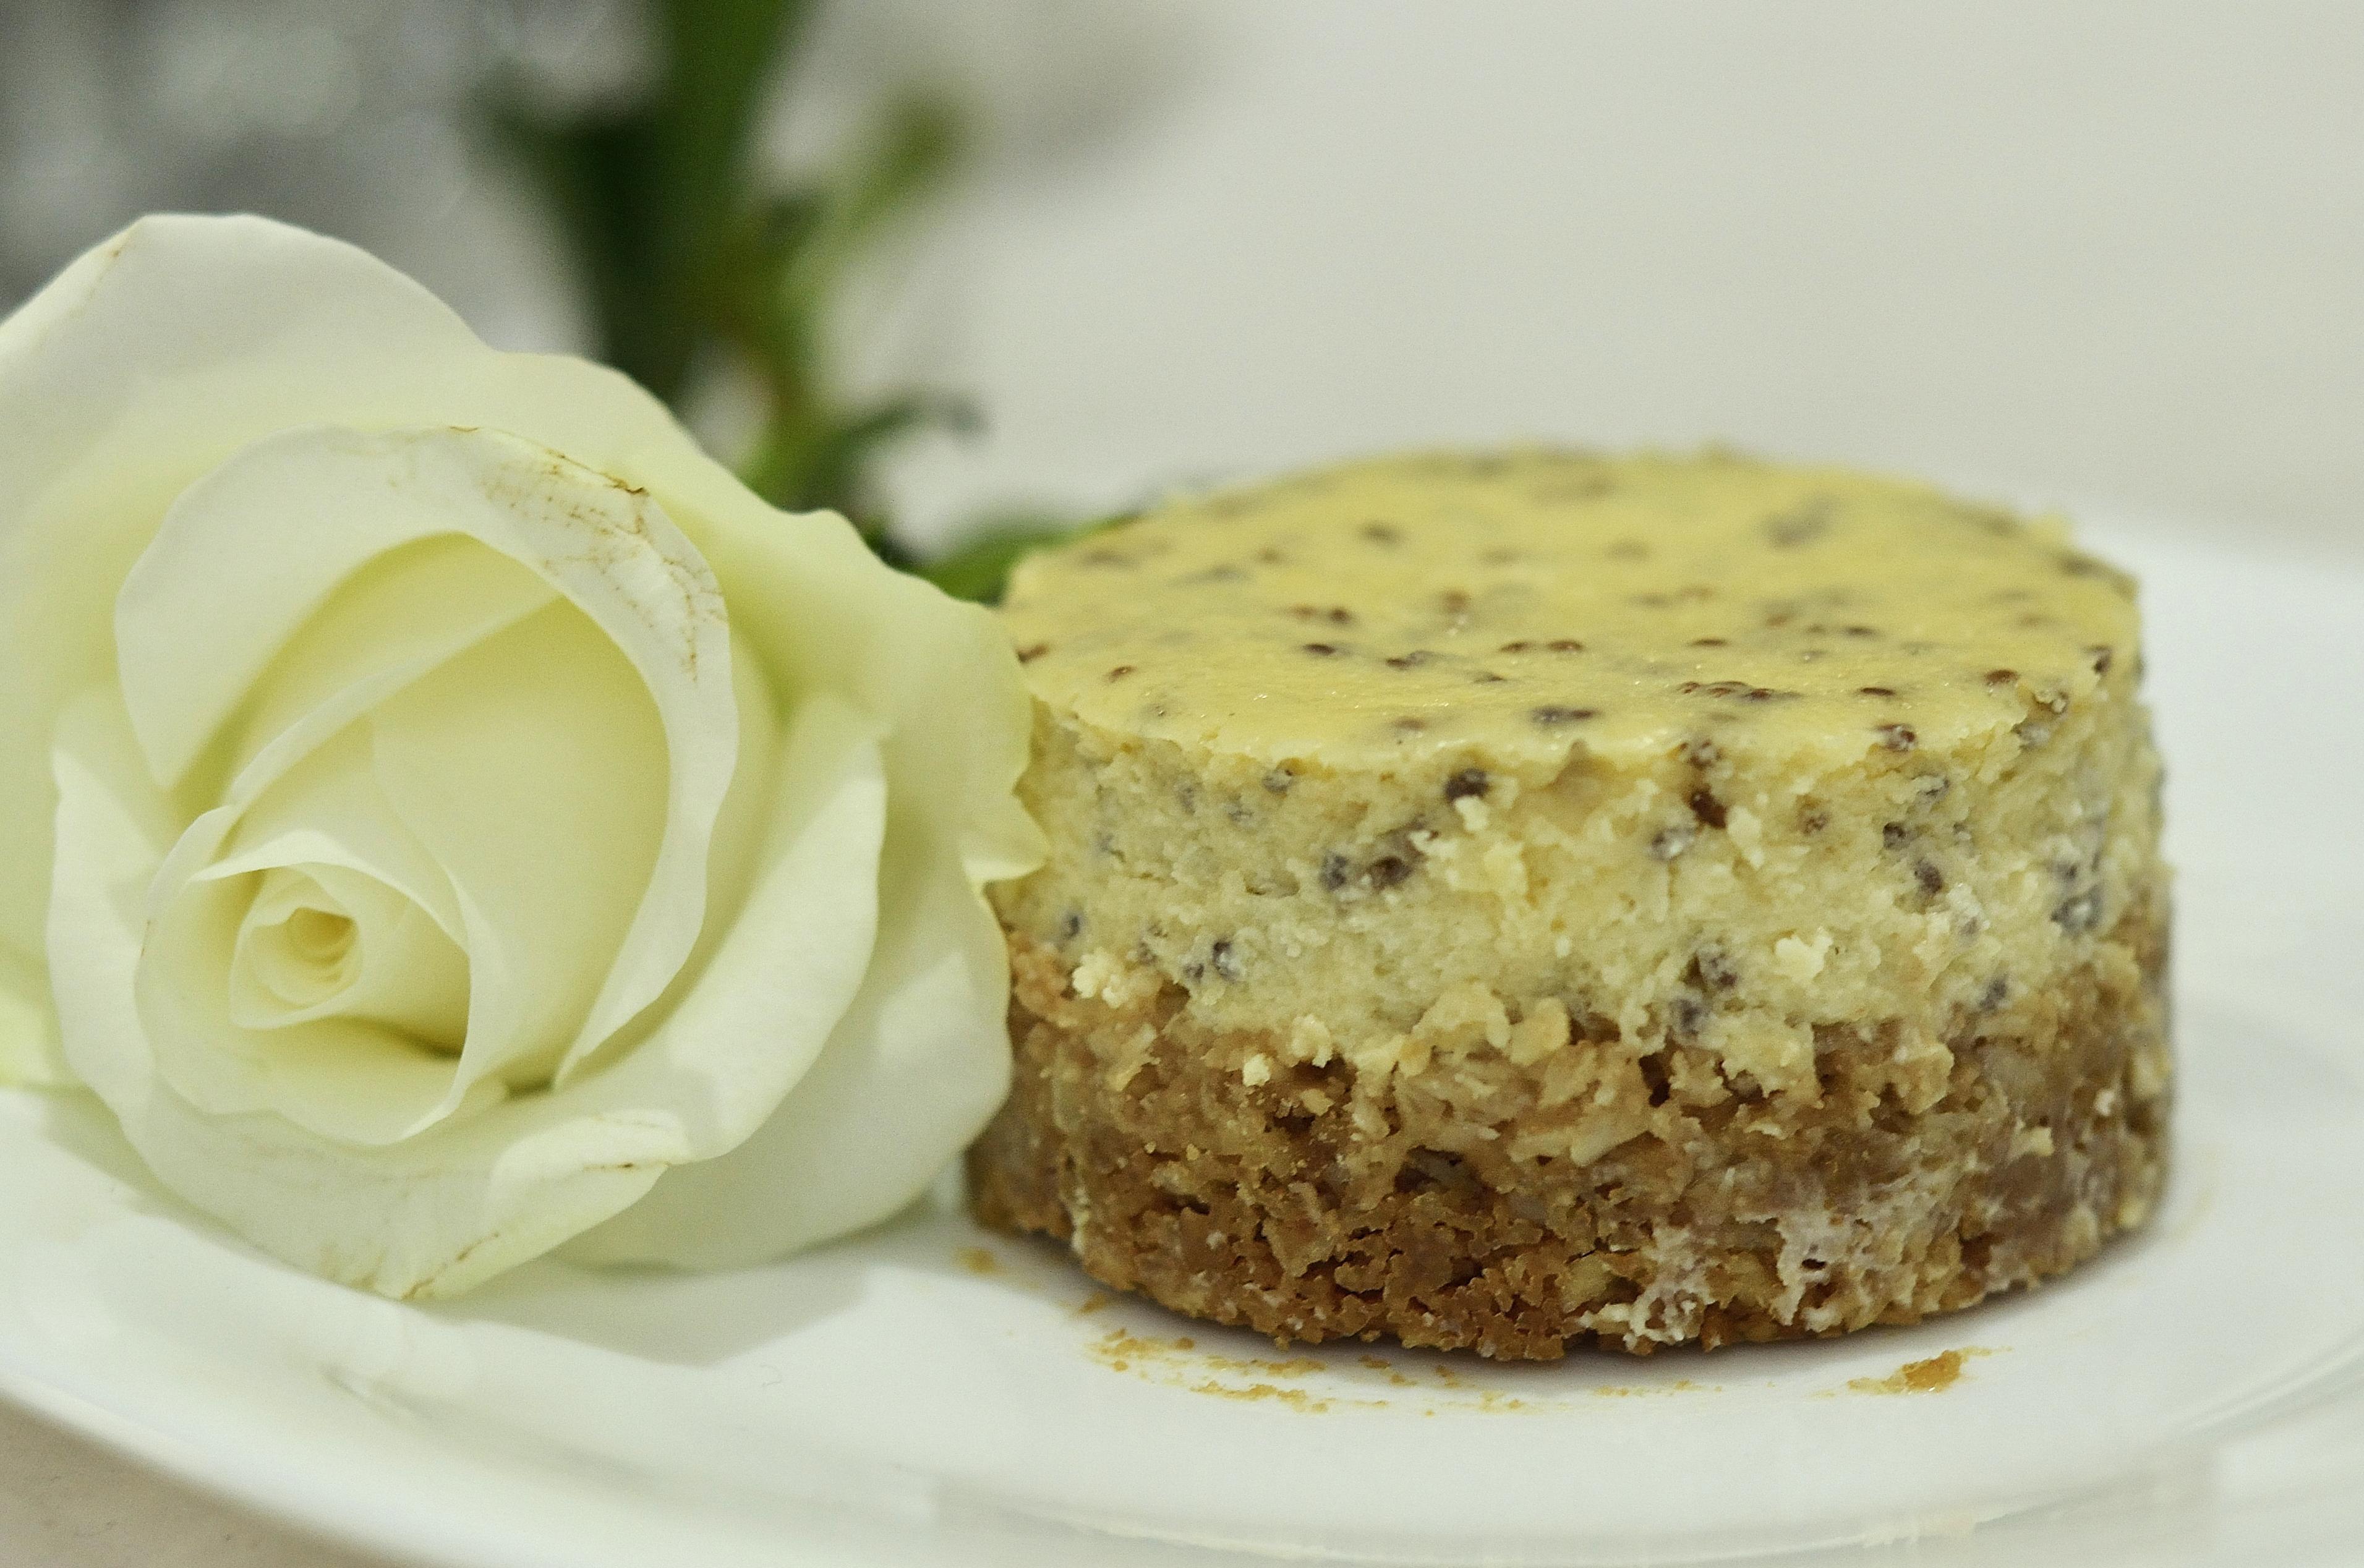 Baked Lemon Cheesecake (Gluten and sugar free) | Tolu's Kitchen